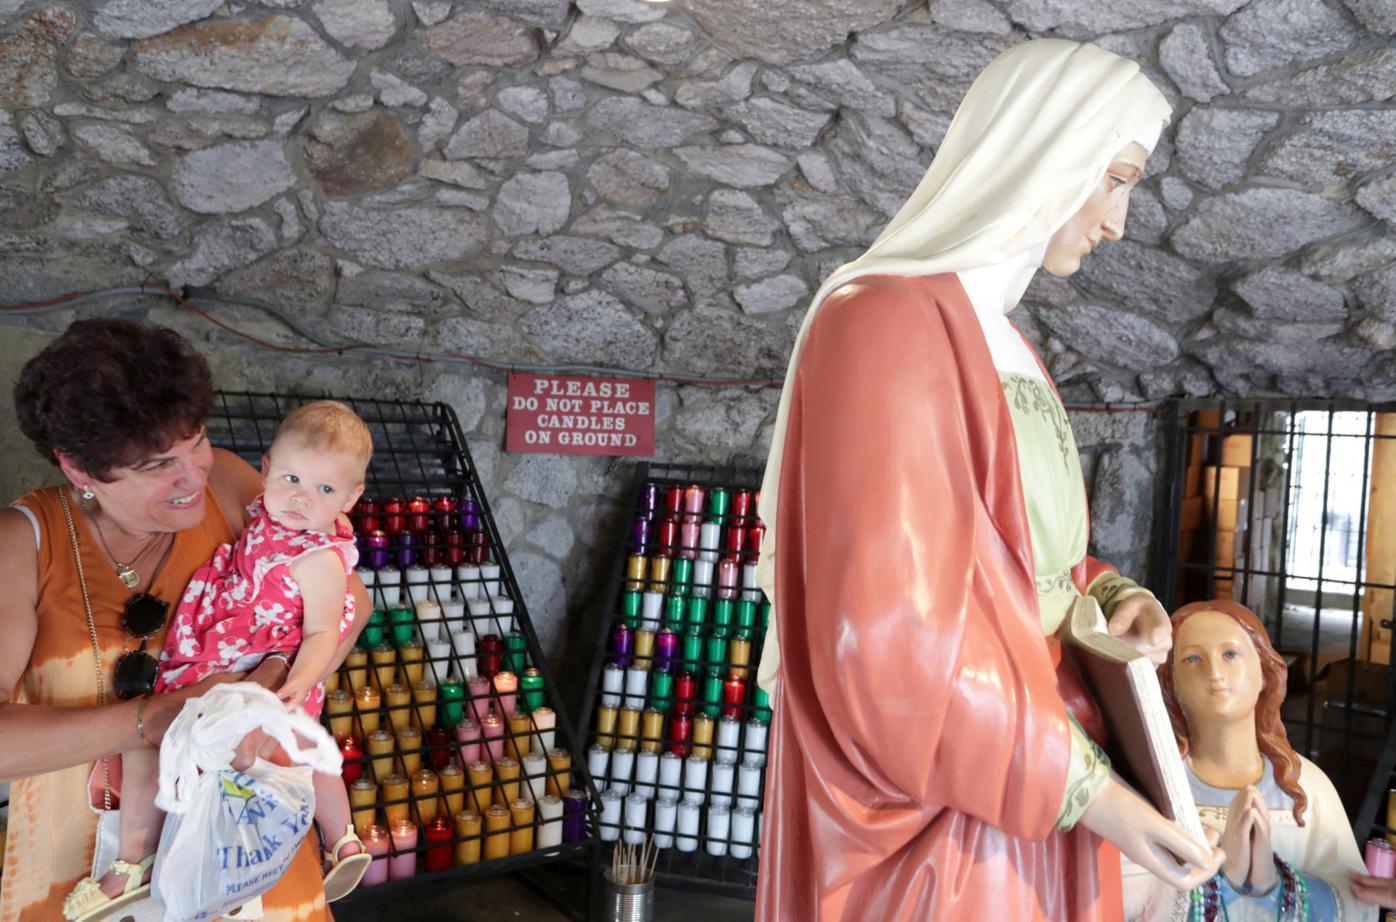 97th annual Solemn Novena to St. Ann continues in Scranton